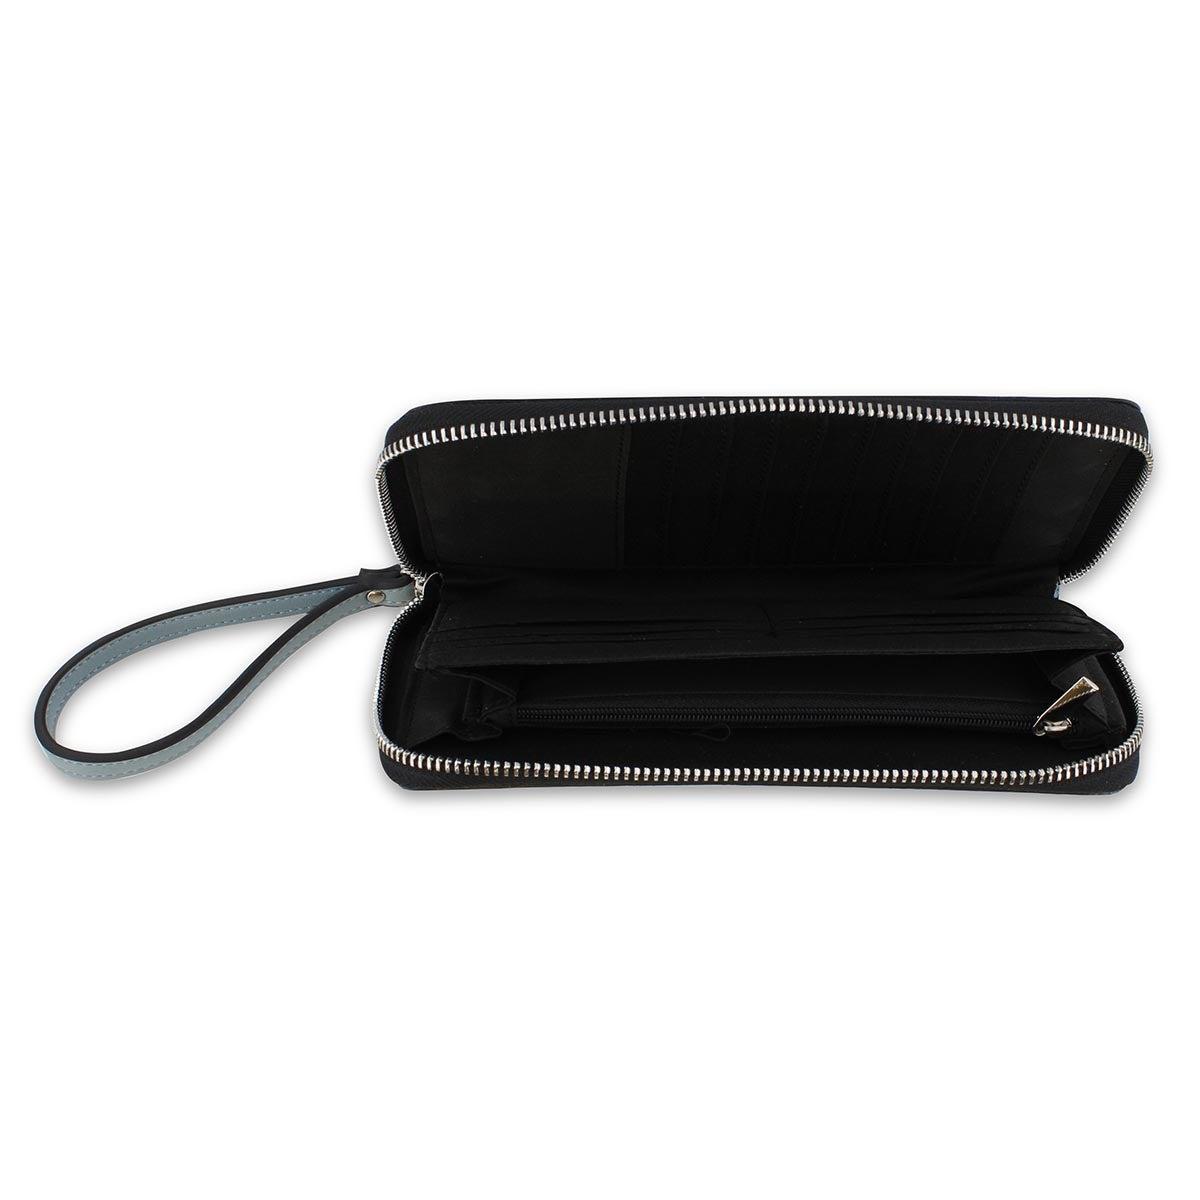 Lds pool blue zip up phone wallet